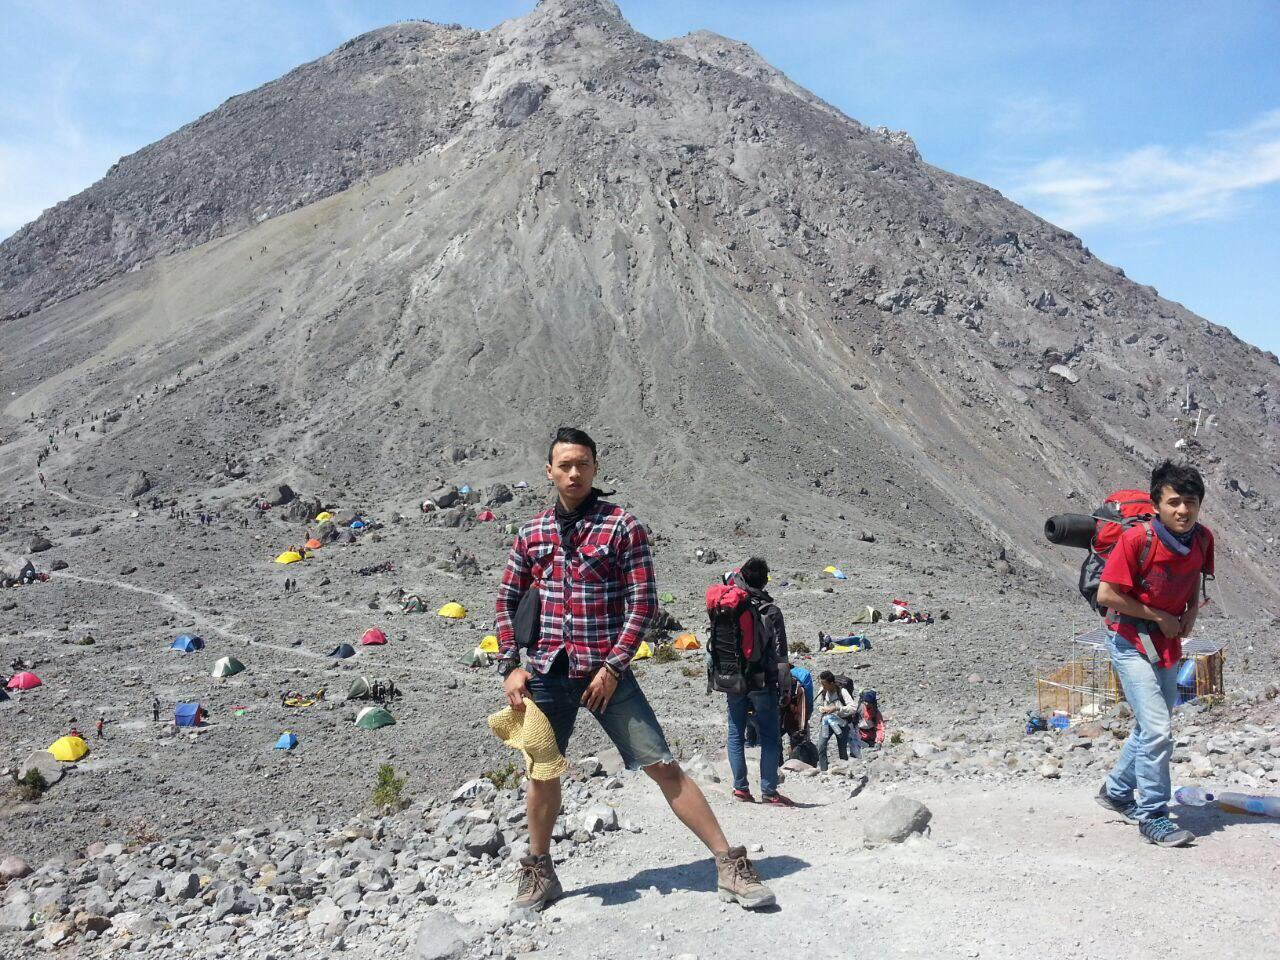 Mau mendaki Gunung Merapi? Berikut tips amannya